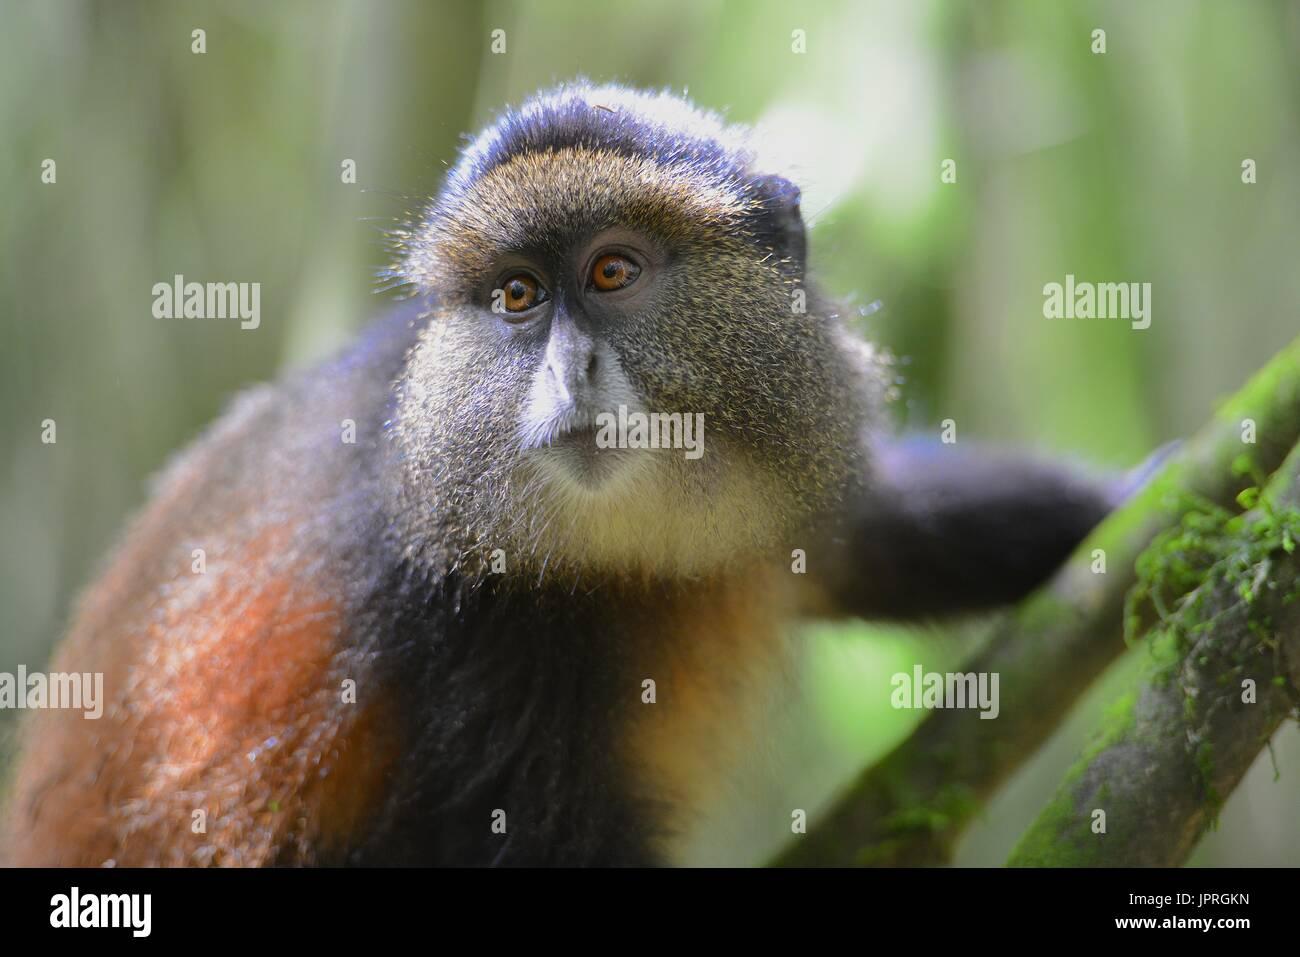 Golden monkeys living in the Virunga Mountains of Northern Rwanda. - Stock Image